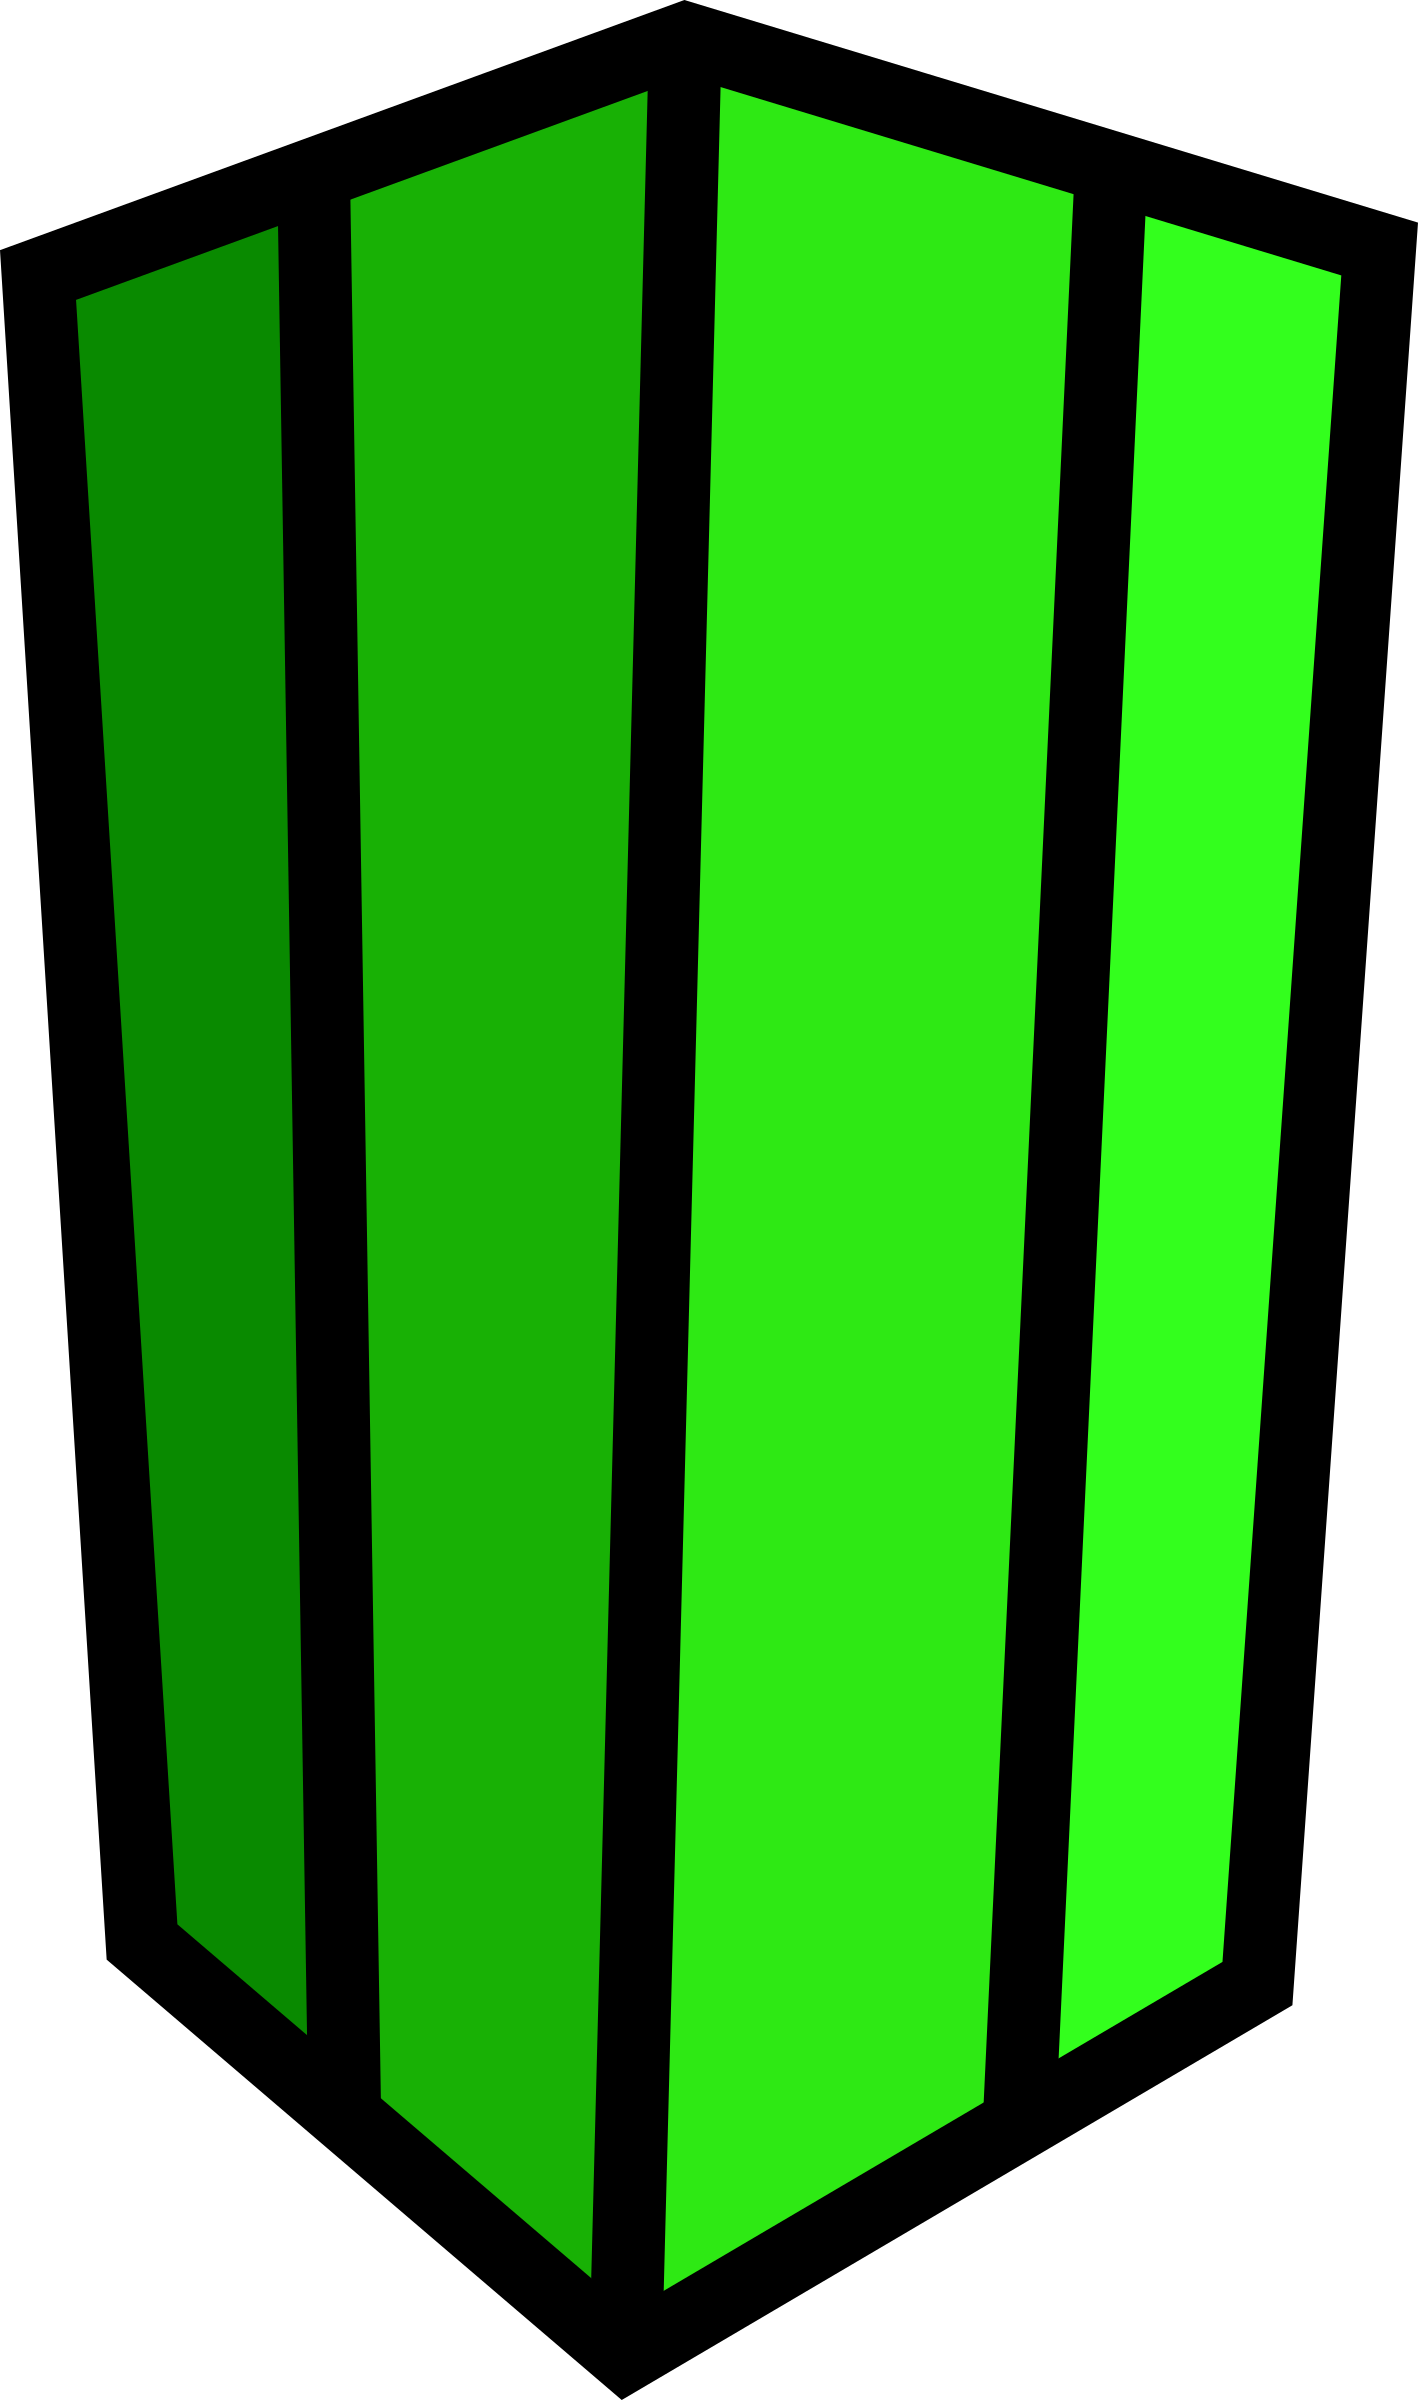 1418x2400 Minecraft Cactus Vector Clipart Image